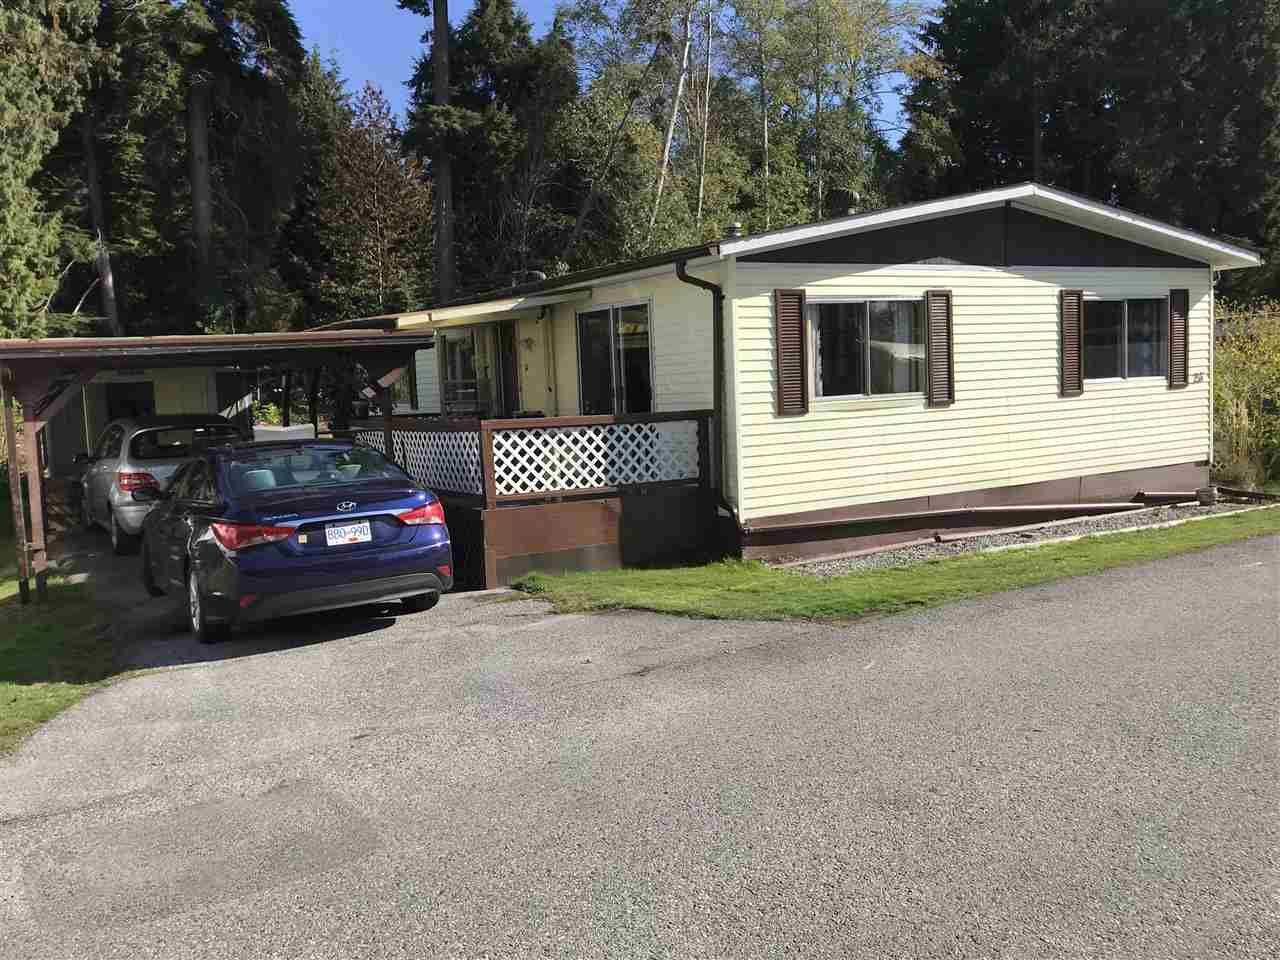 Main Photo: 25 4496 SUNSHINE COAST Highway in Sechelt: Sechelt District Manufactured Home for sale (Sunshine Coast)  : MLS®# R2217808